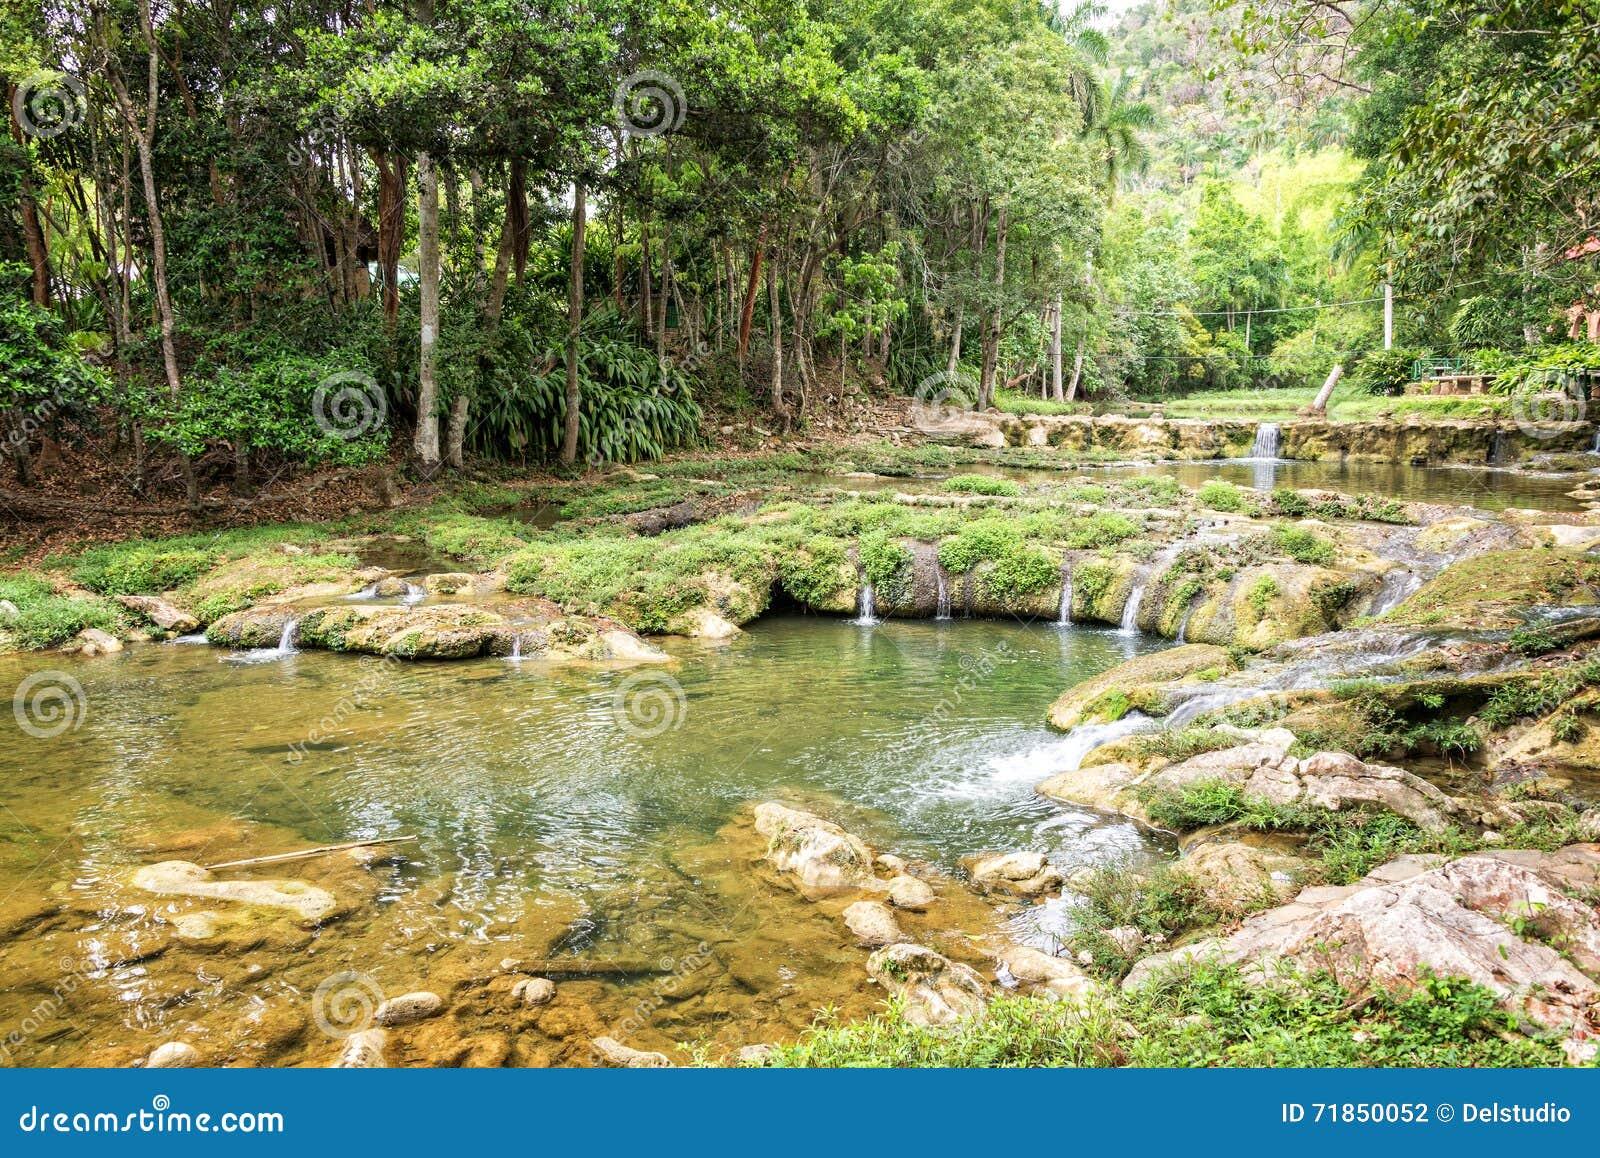 Natural Pool In Rio San Juan Las Terrazas Cuba Stock Photo